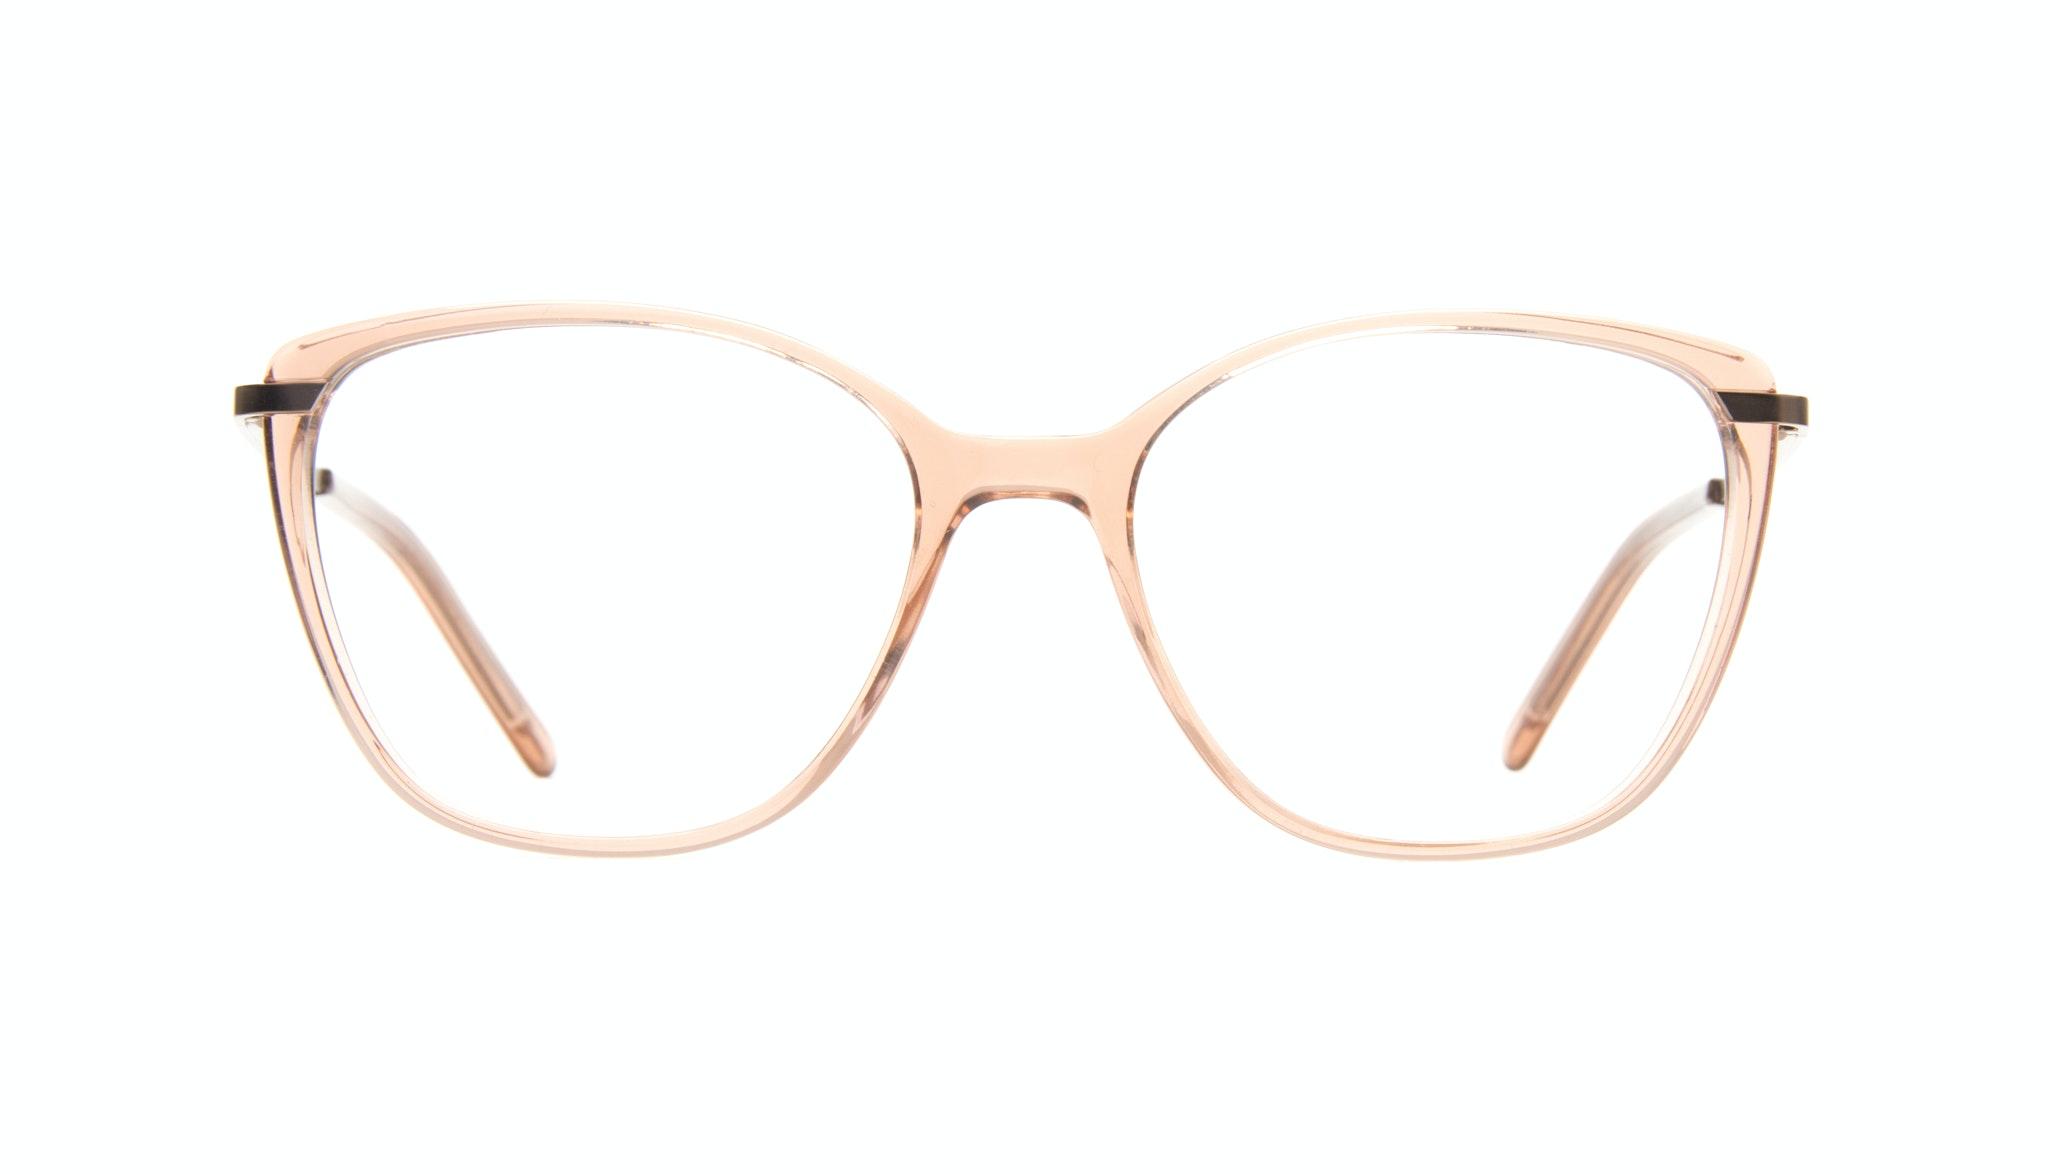 Affordable Fashion Glasses Cat Eye Rectangle Square Eyeglasses Women Illusion Rose Front